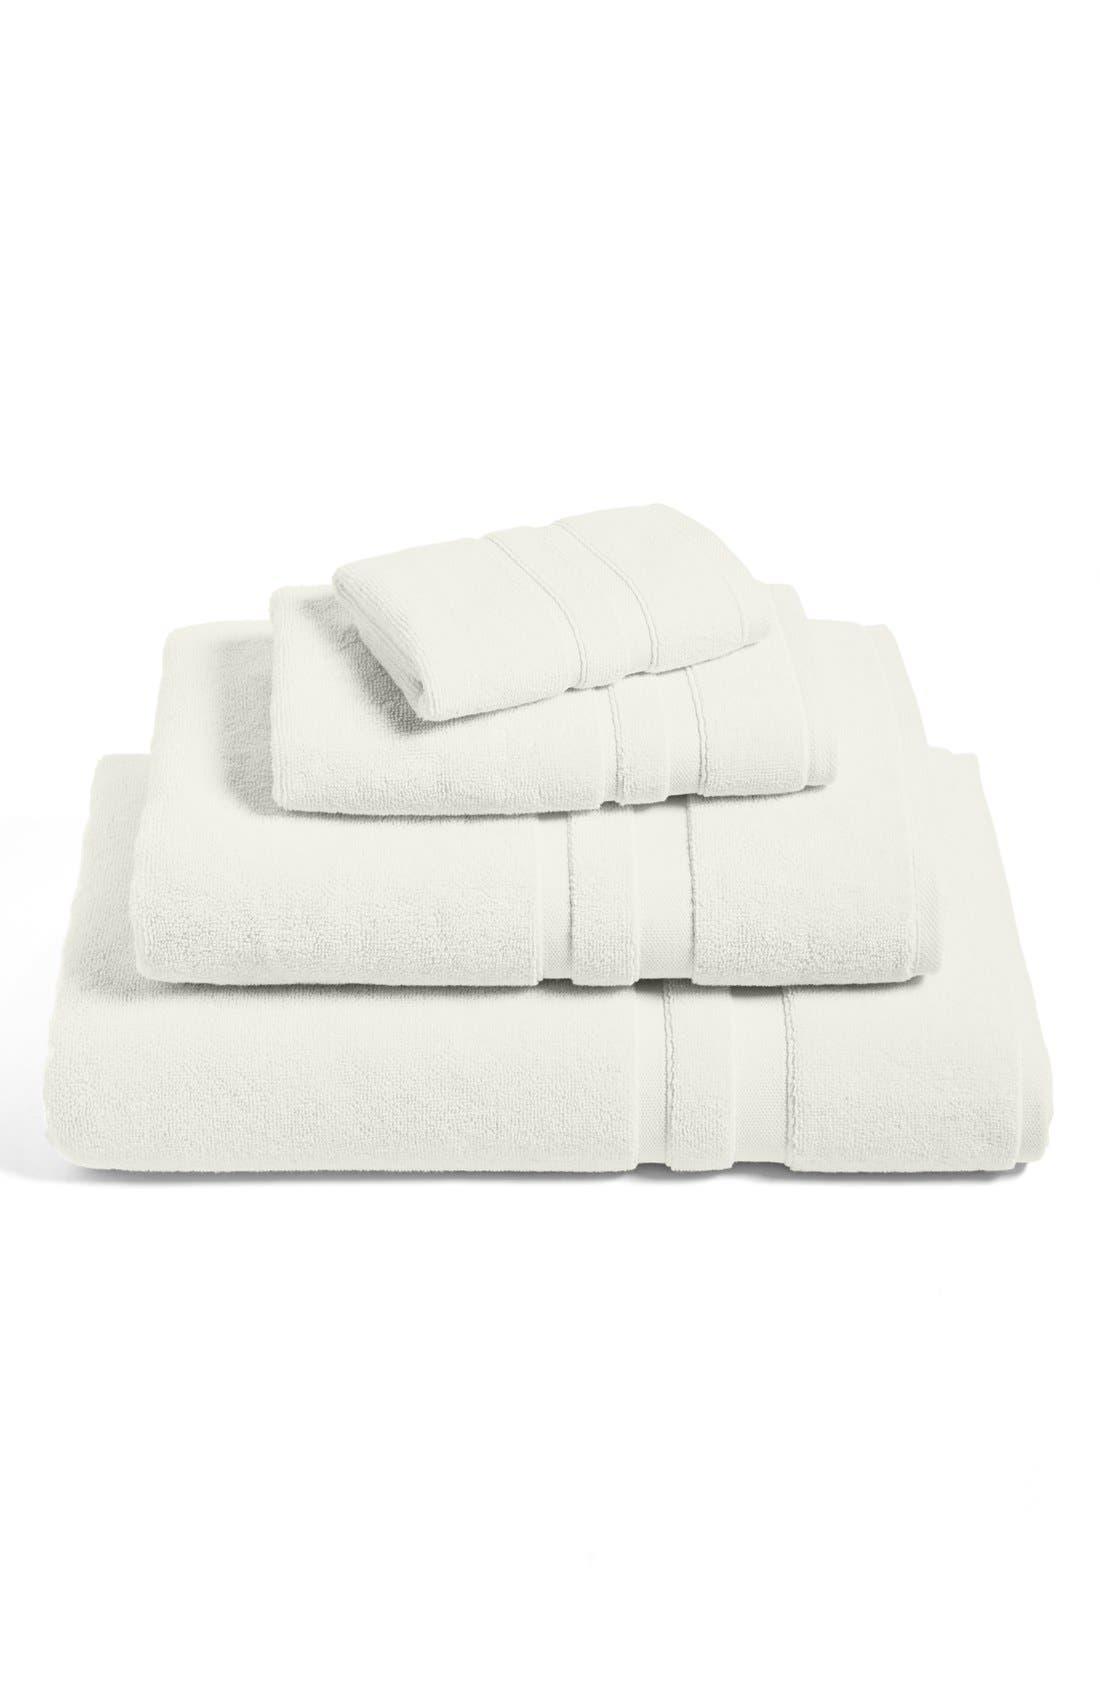 Waterworks Studio 'Perennial' Turkish Cotton Towel Collection